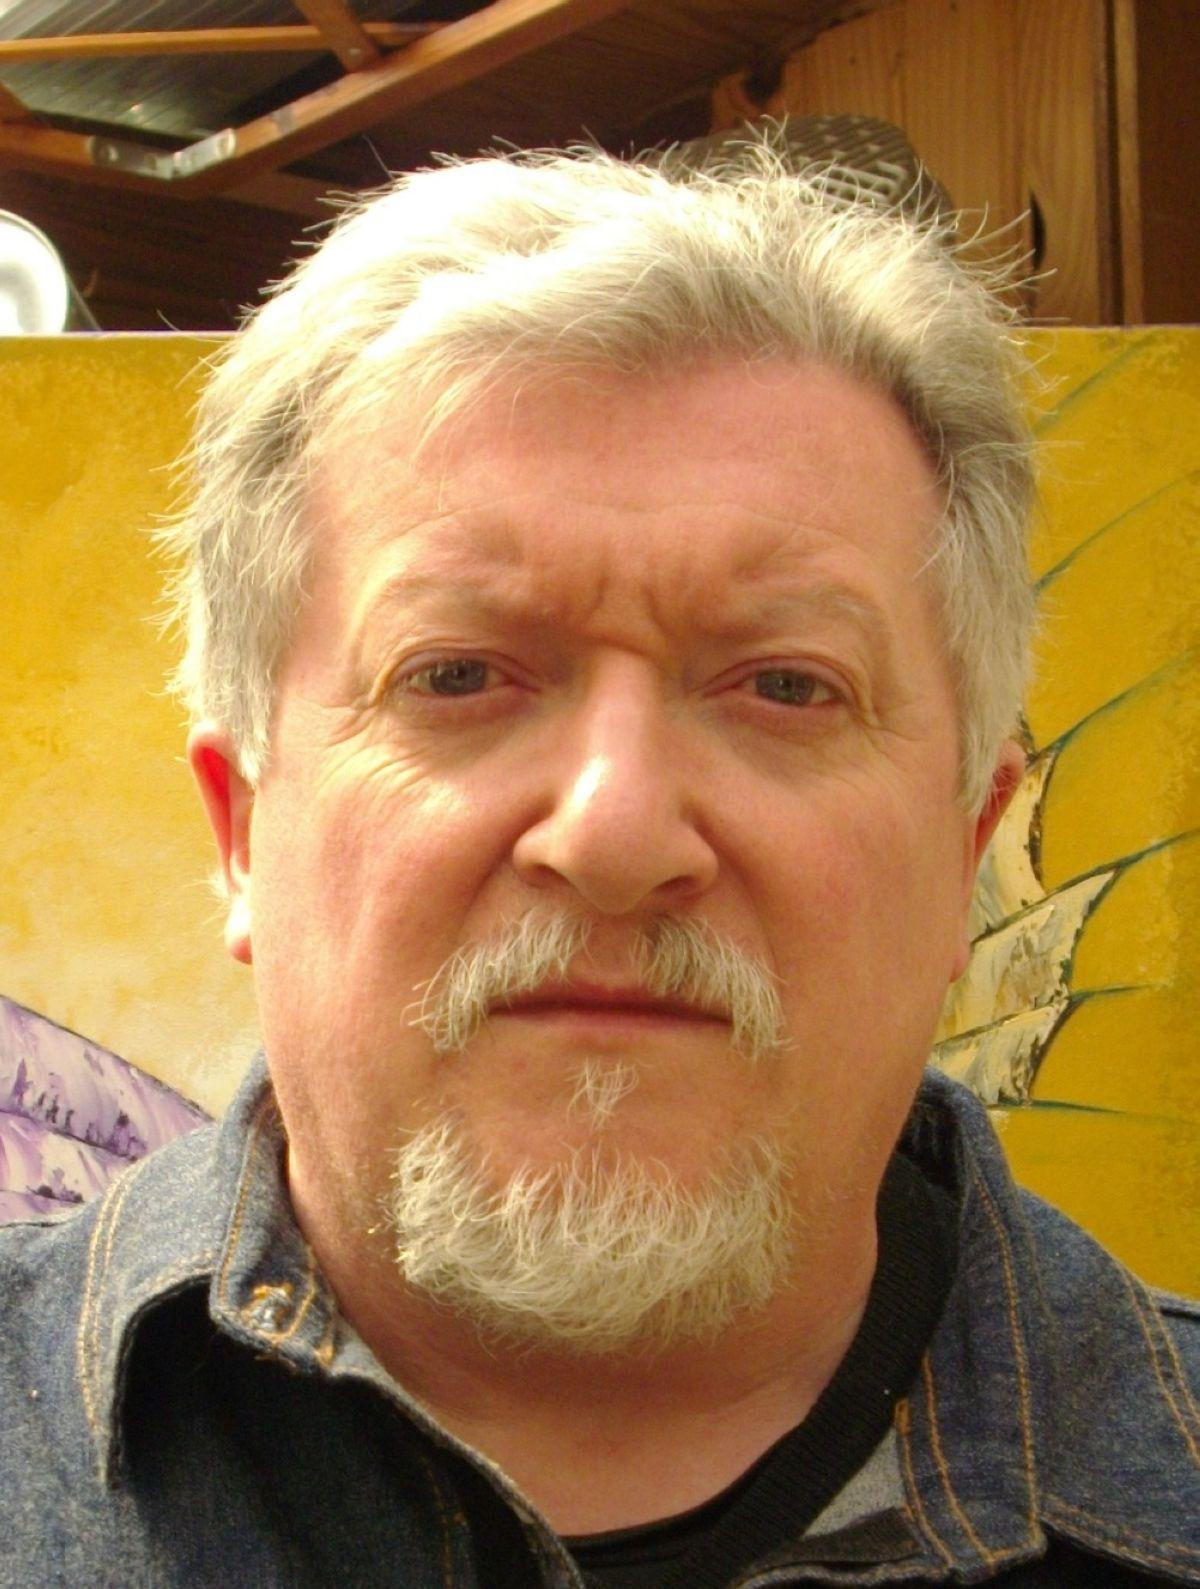 PatrickBERTHAULT